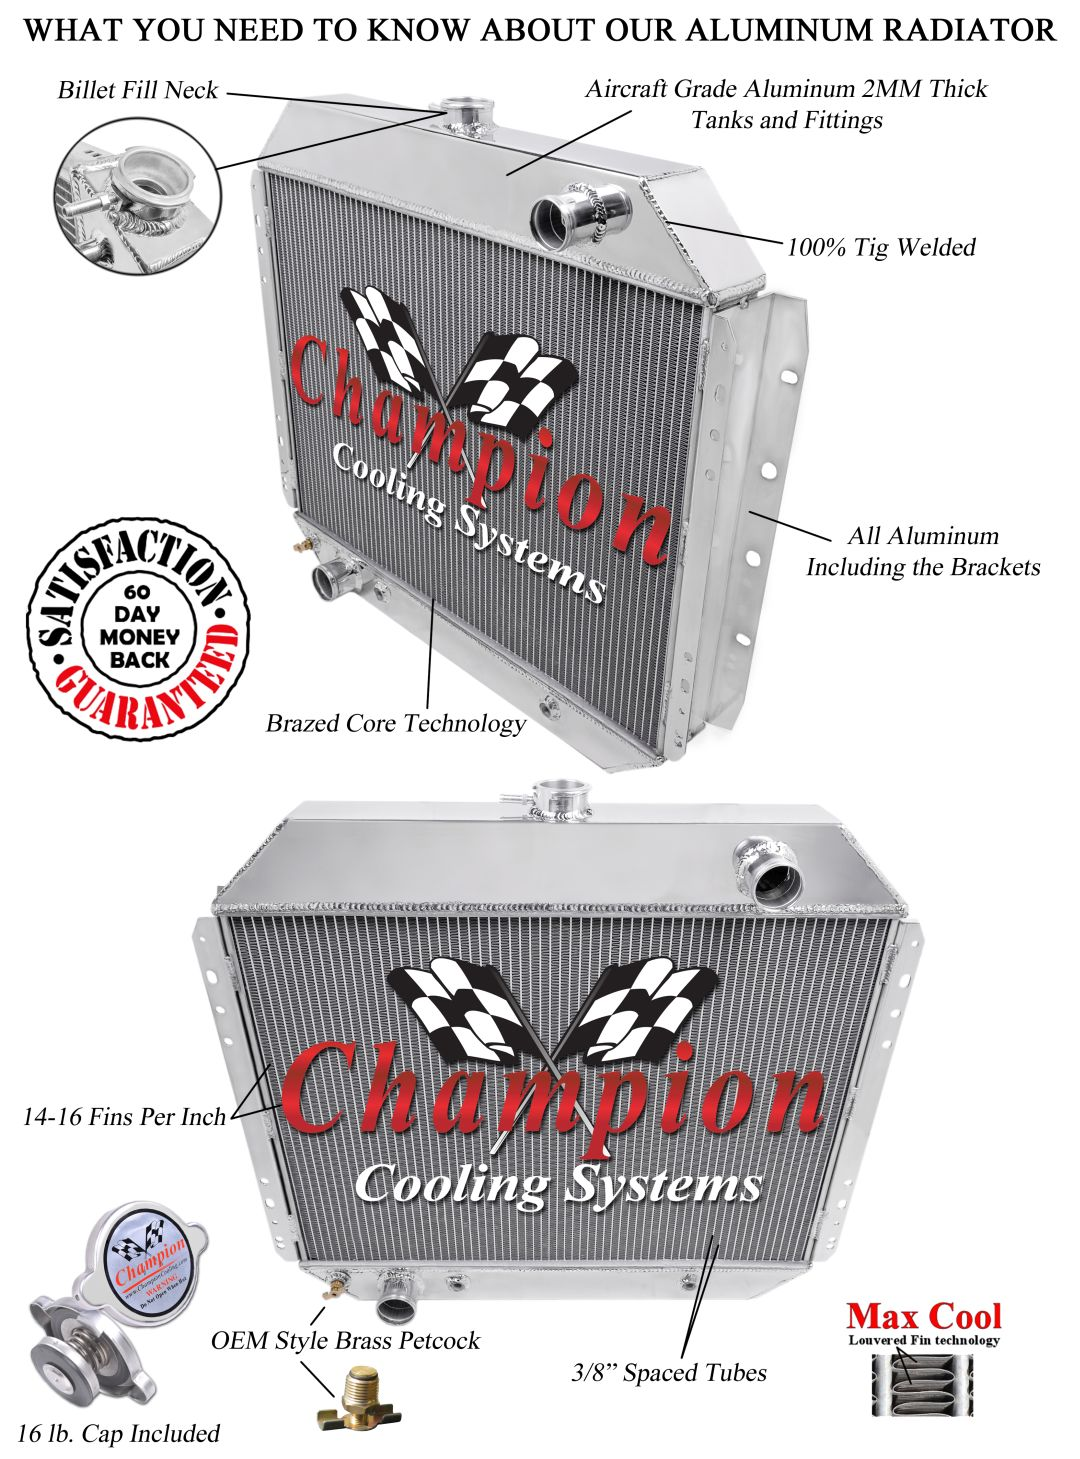 1979 ford bronco engine diagram 2 row 1  tubes reliable champion radiator for 1978 1979 ford  champion radiator for 1978 1979 ford